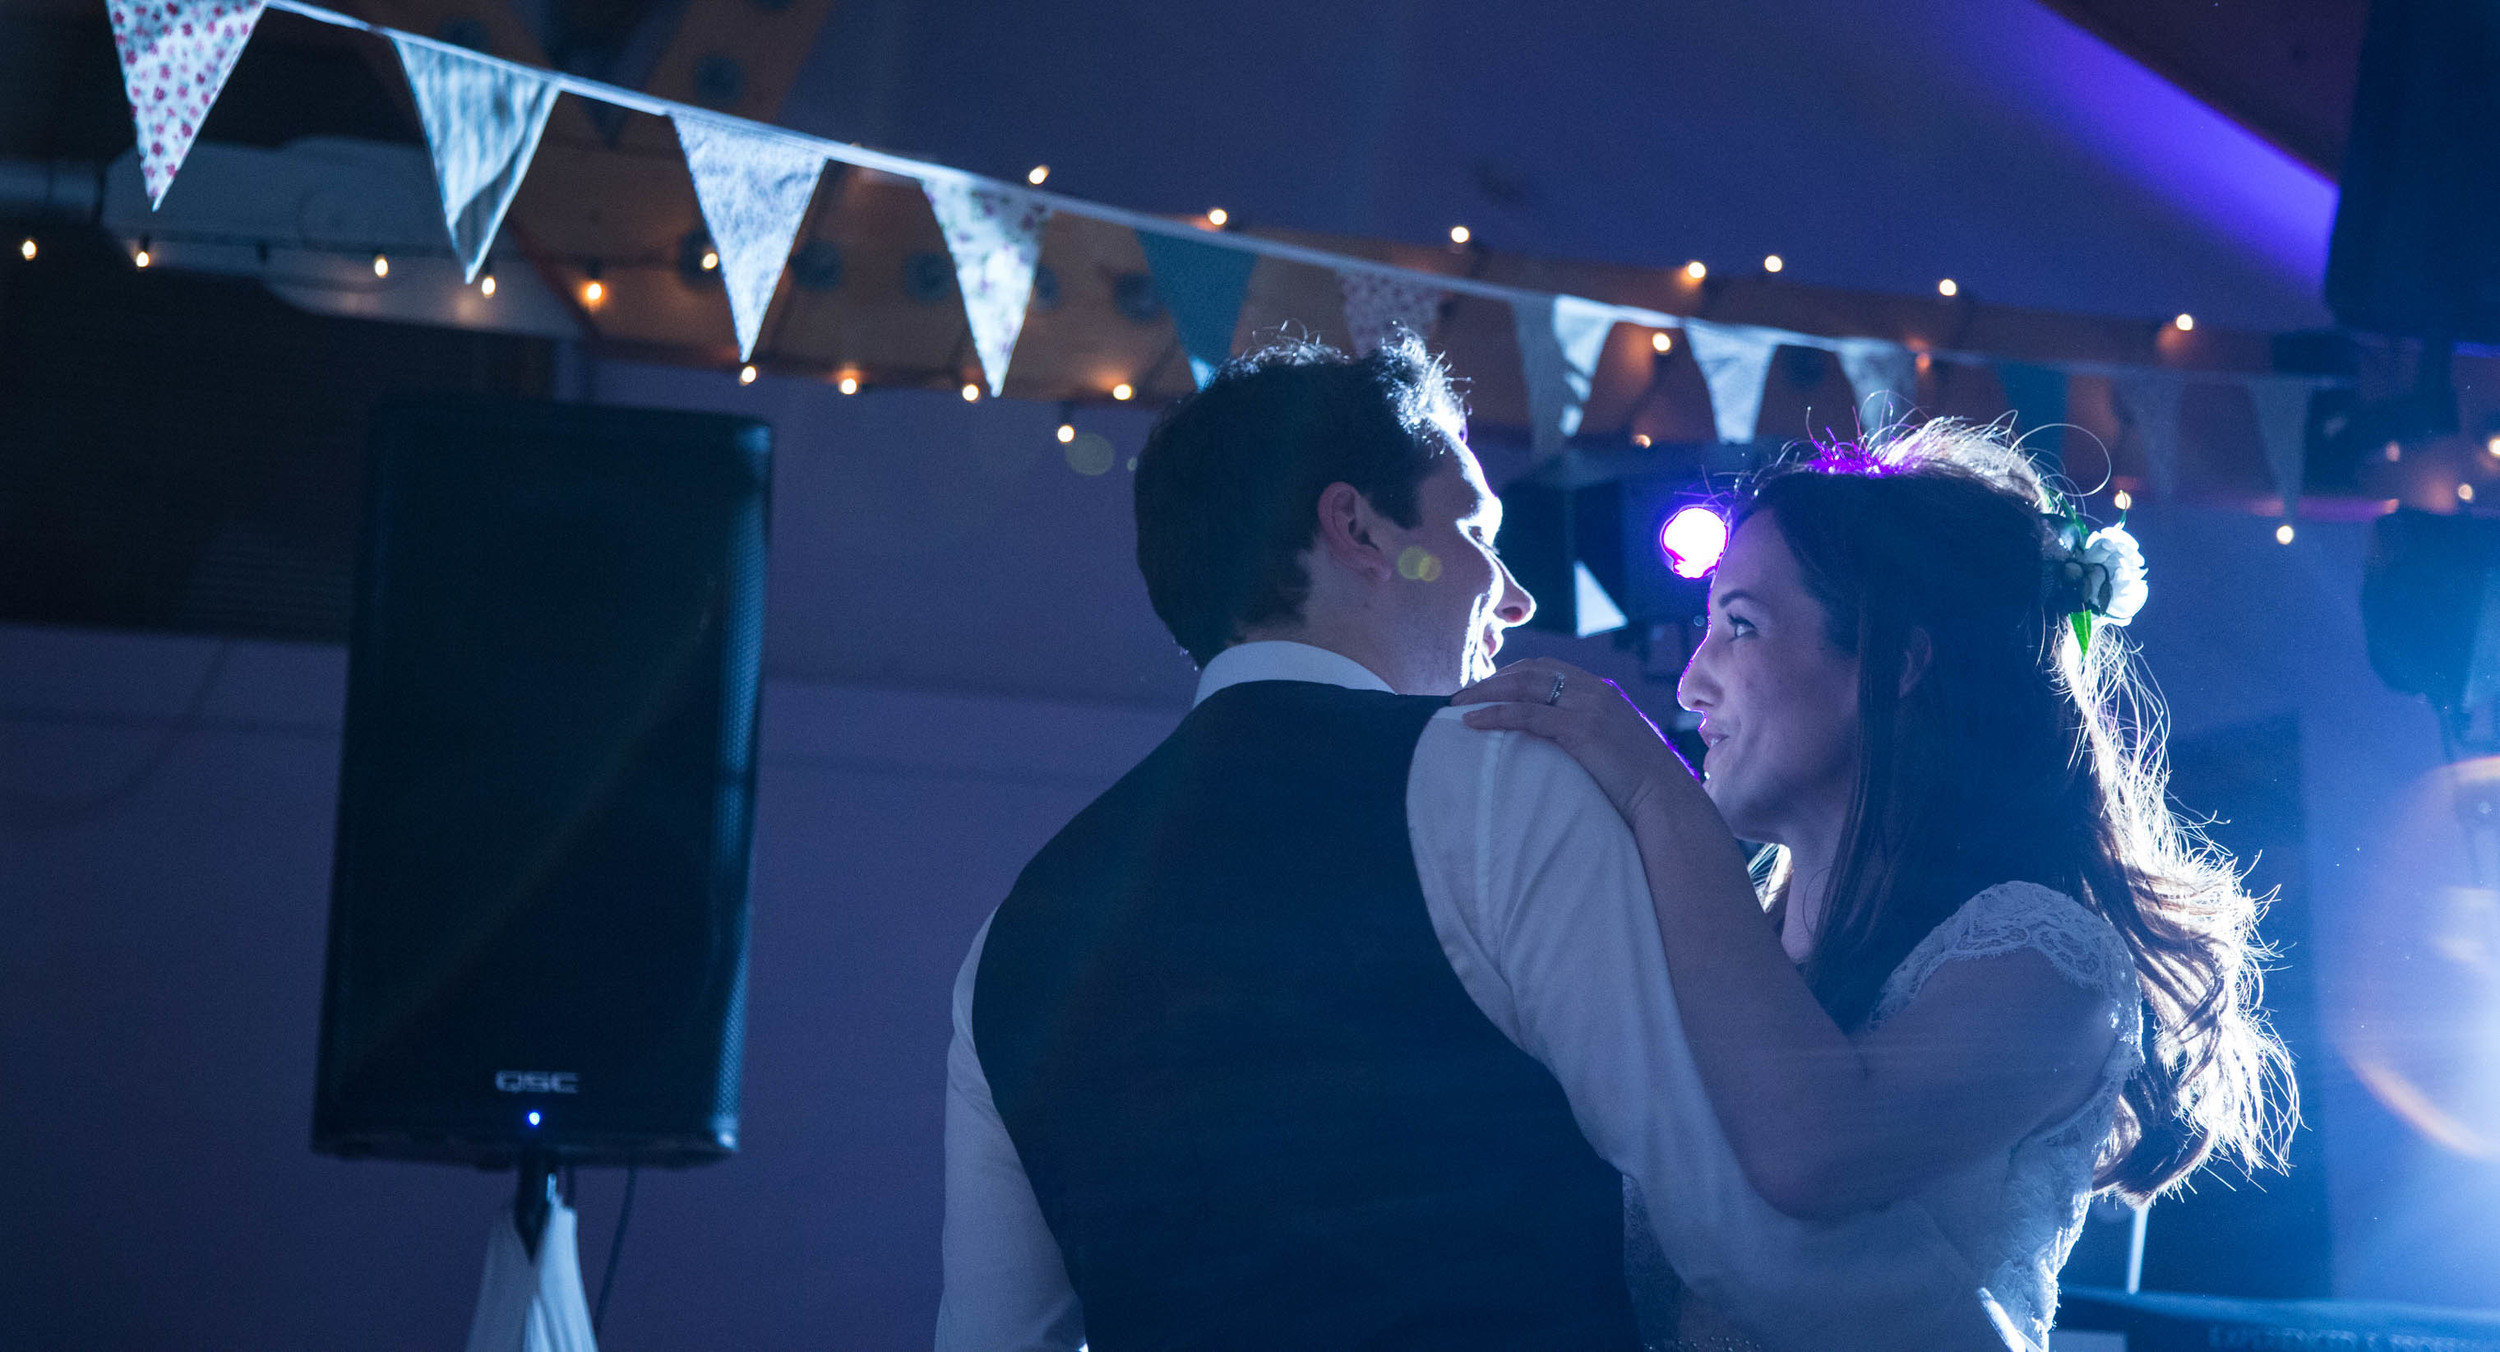 barnes-wedding-adam-rowley-photographer-first-dance